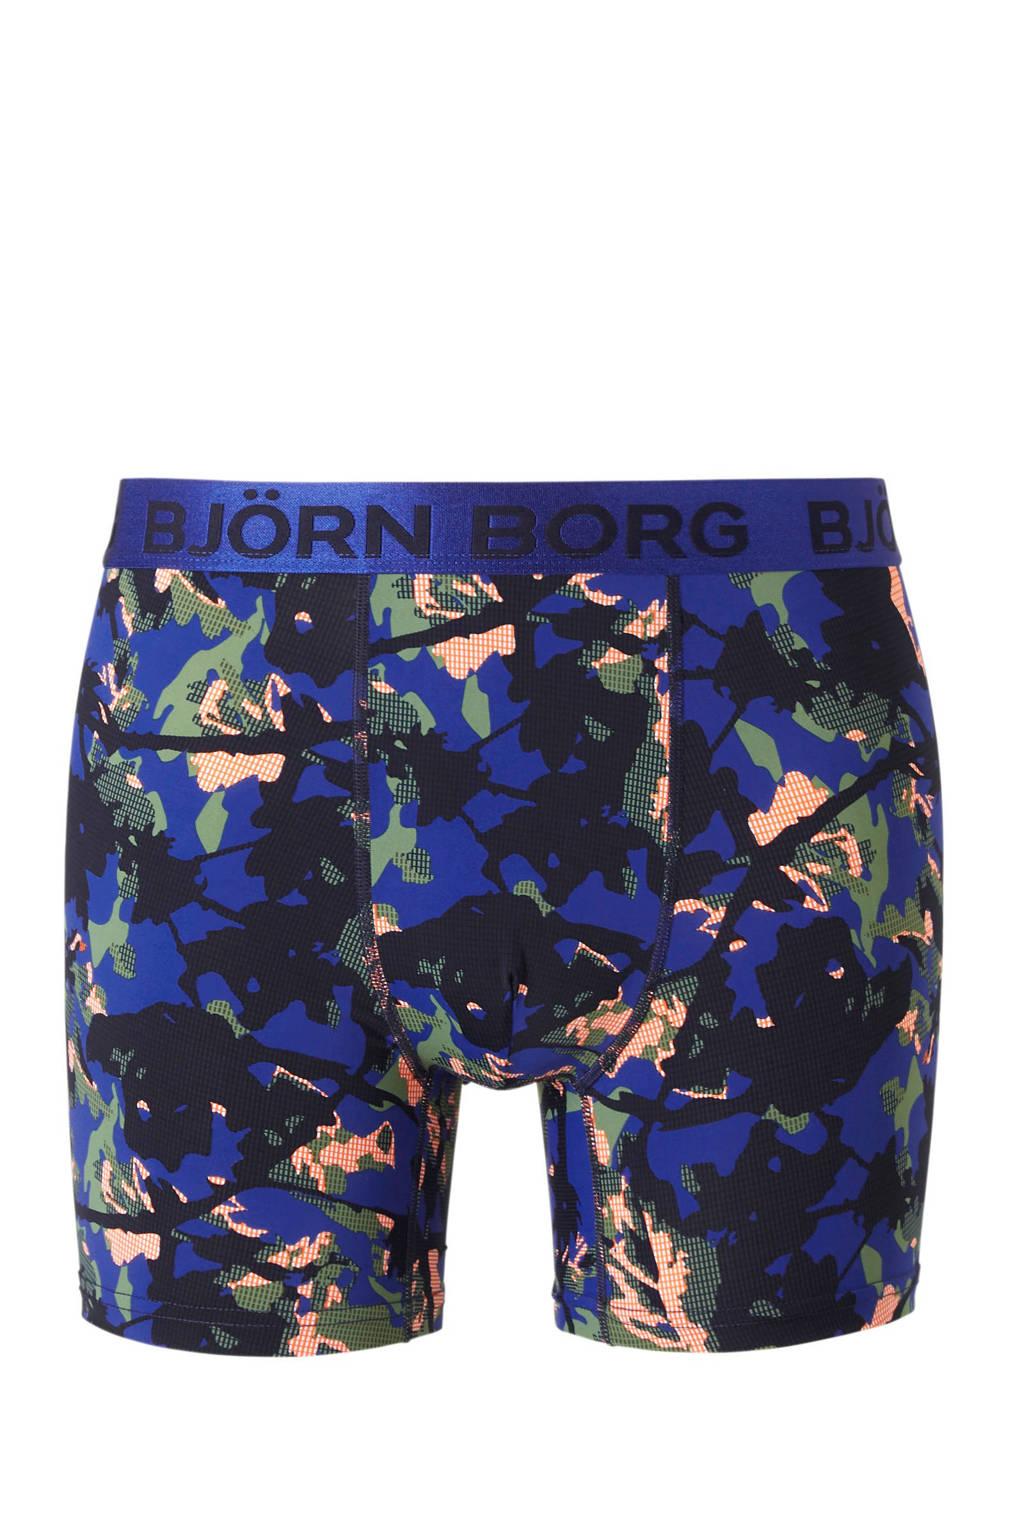 Björn Borg sportboxer, donkerblauw/zwart/groen/oranje